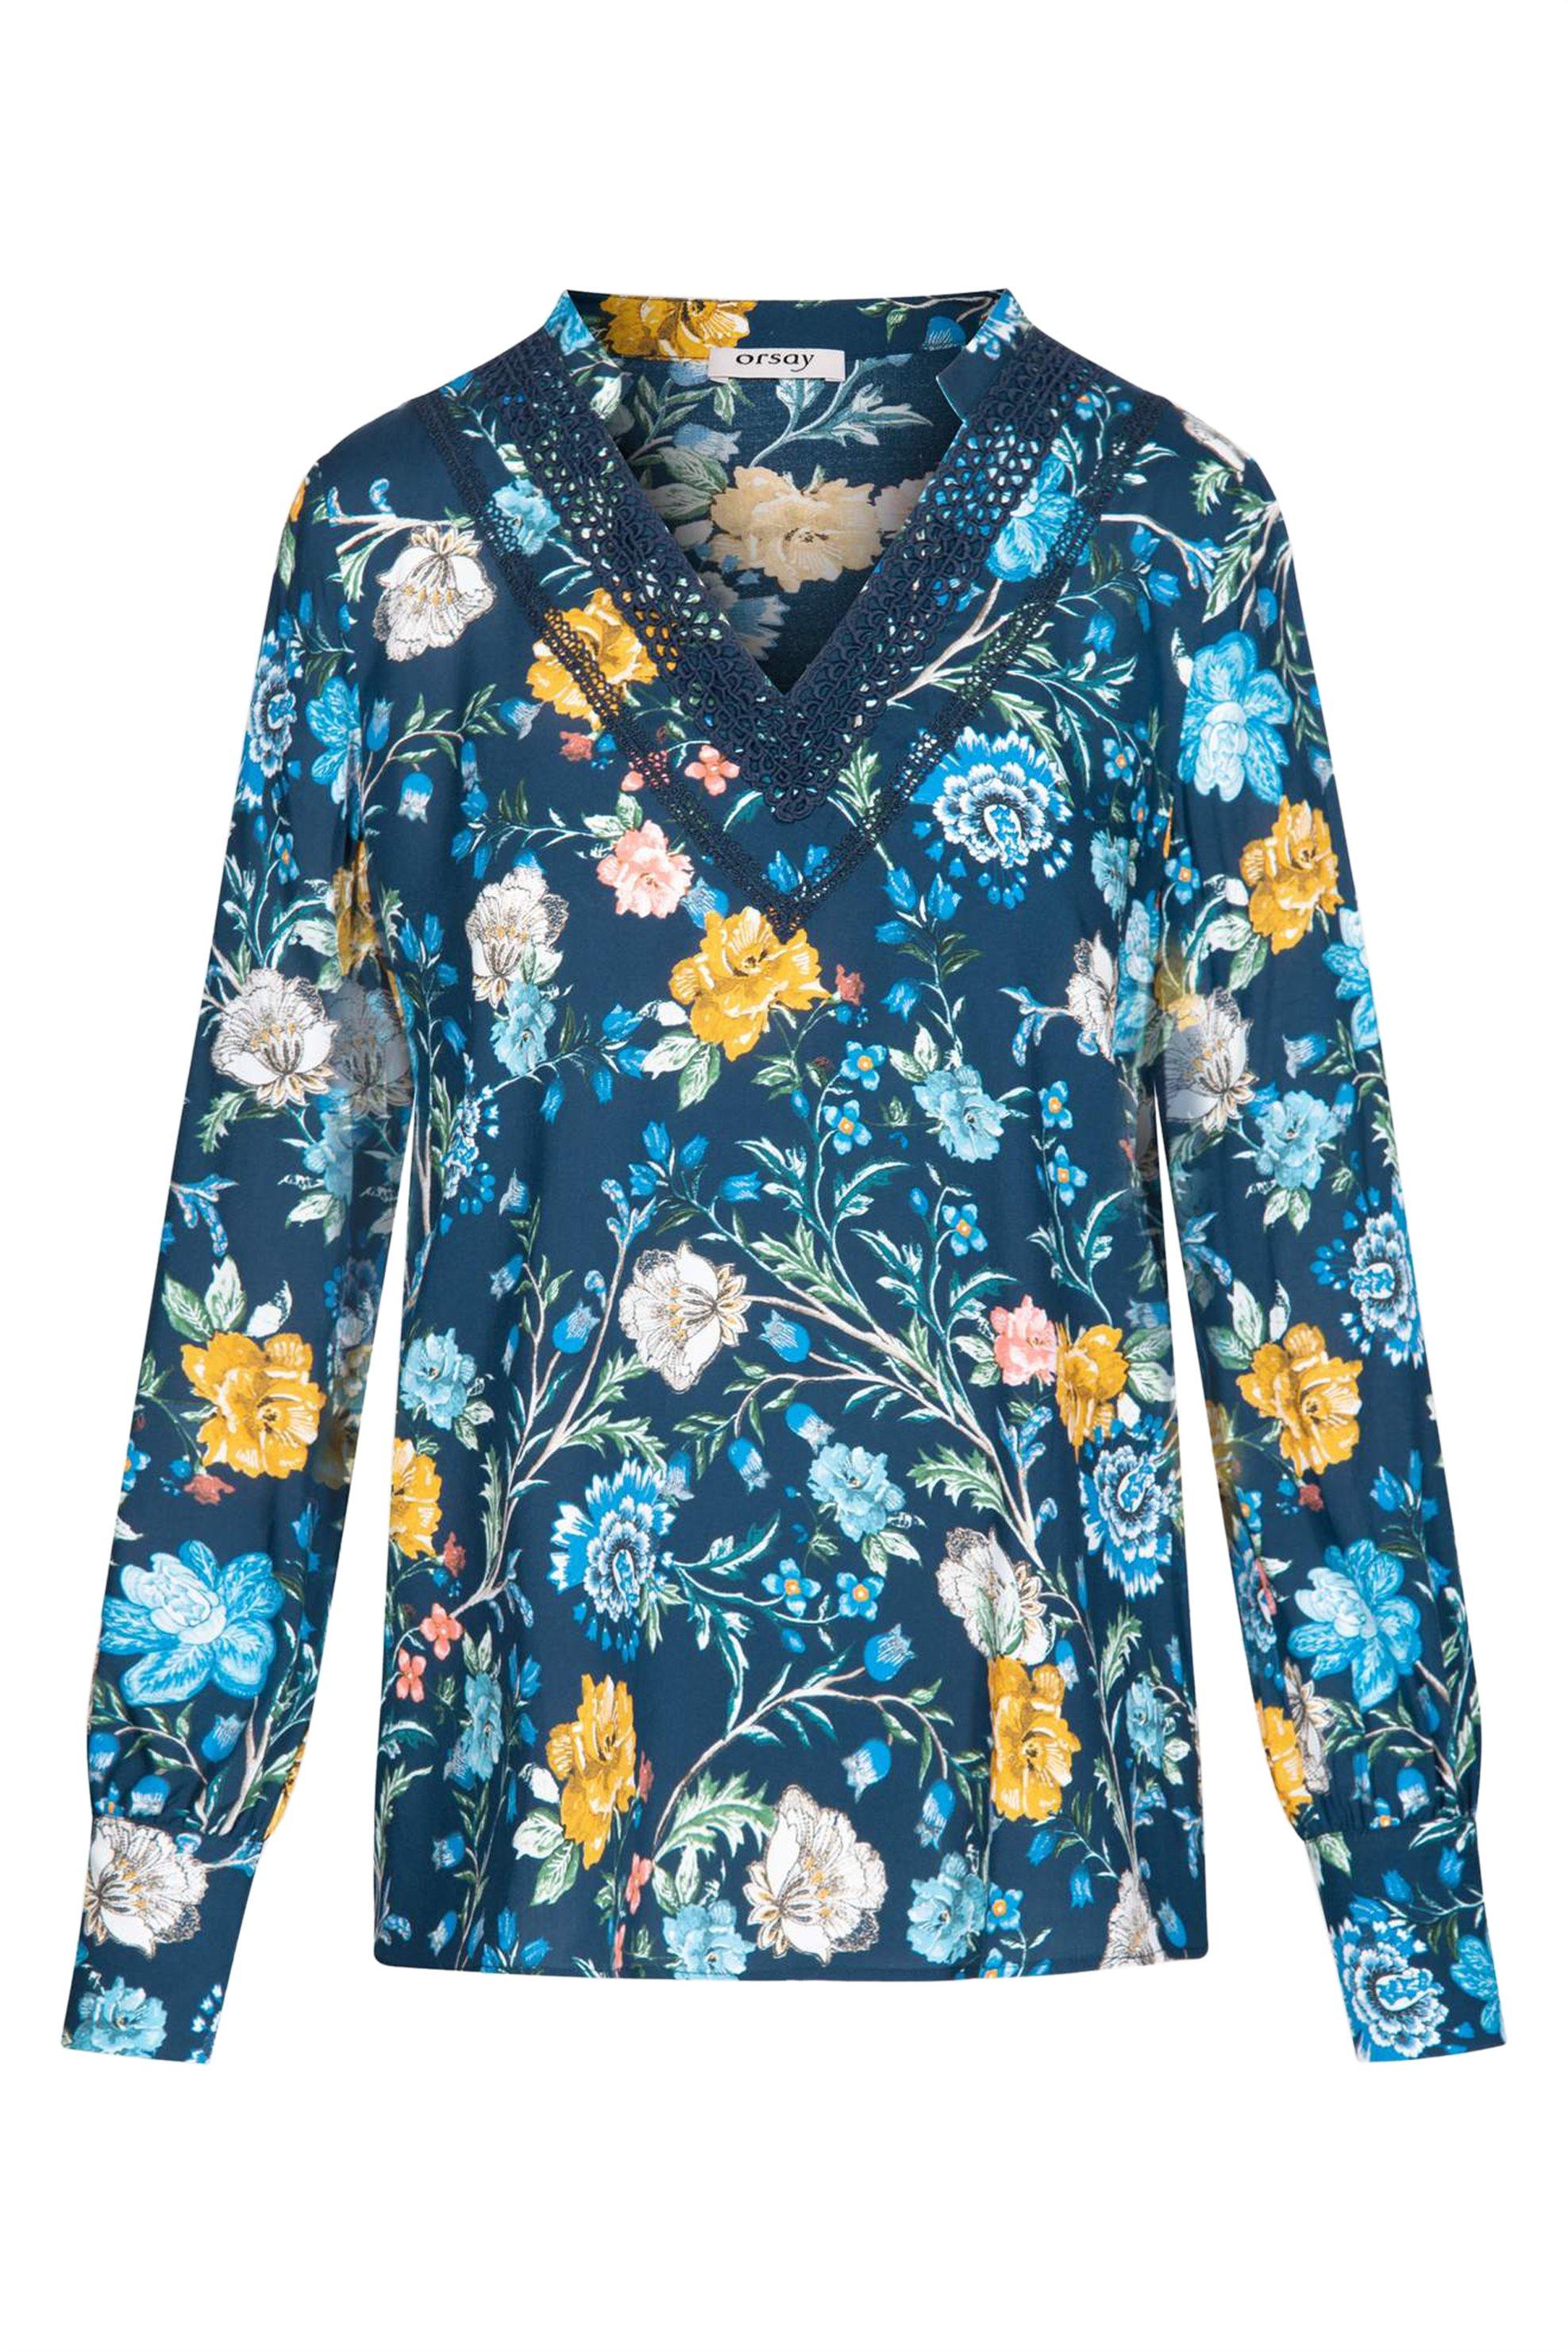 Orsay γυναικεία εμπριμέ μπλόυζα με λαιμόκοψη V - 663315-517000 - Μπλε Σκούρο γυναικα   ρουχα   tops   πουκάμισα   casual